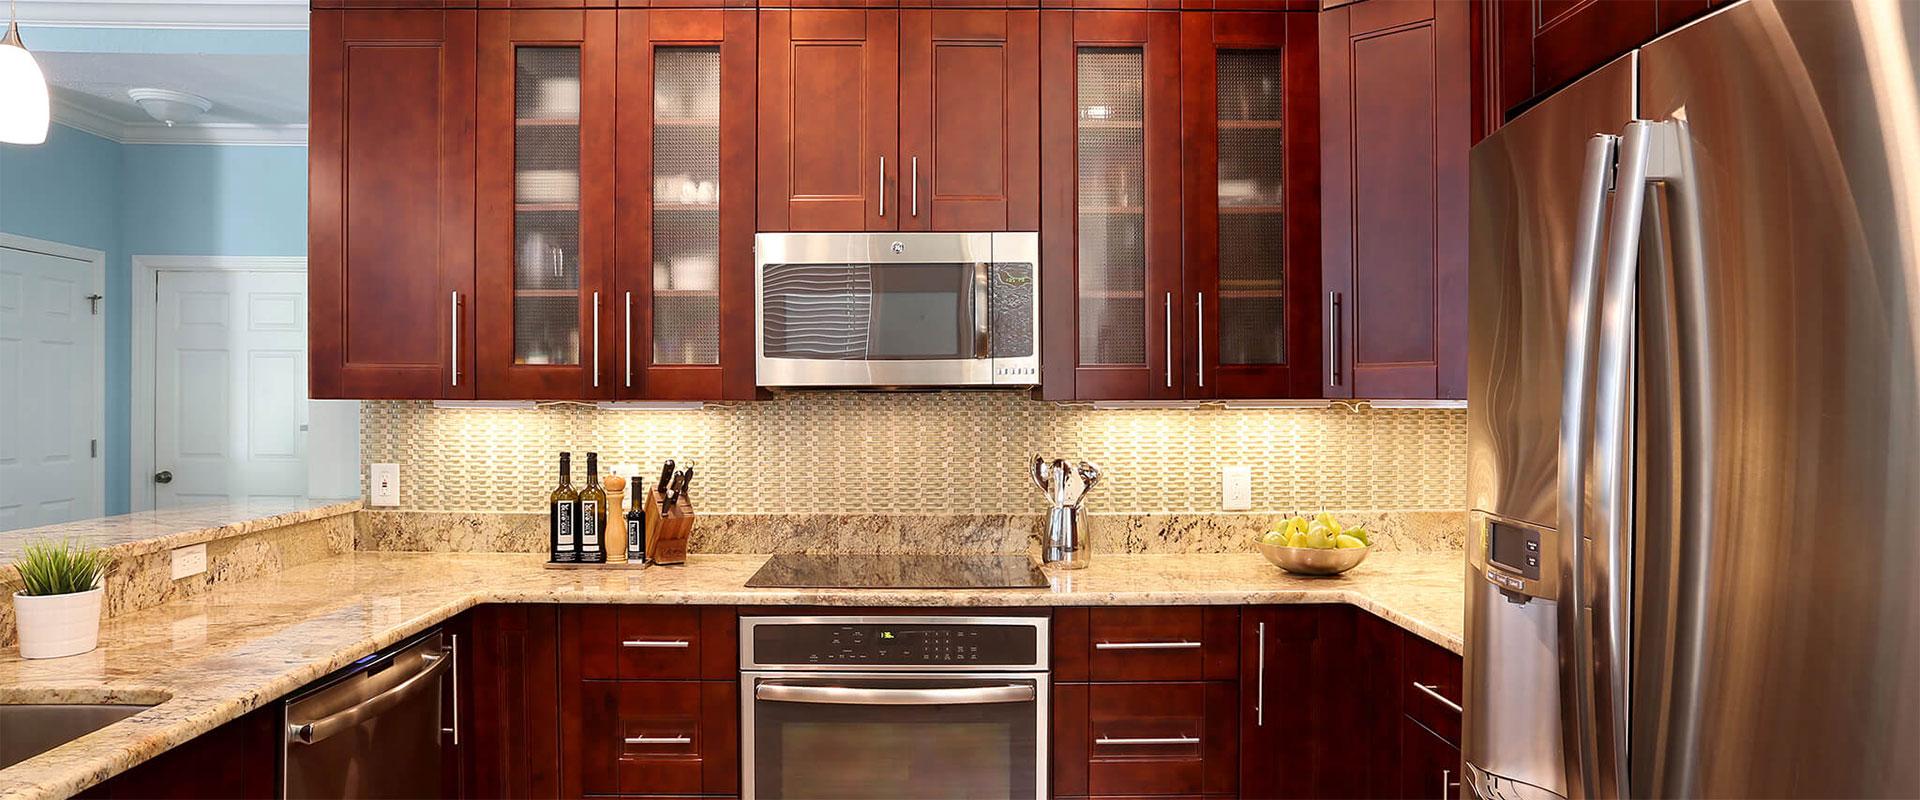 kitchen cabinets | granite countertops | remodeling | tampa fl